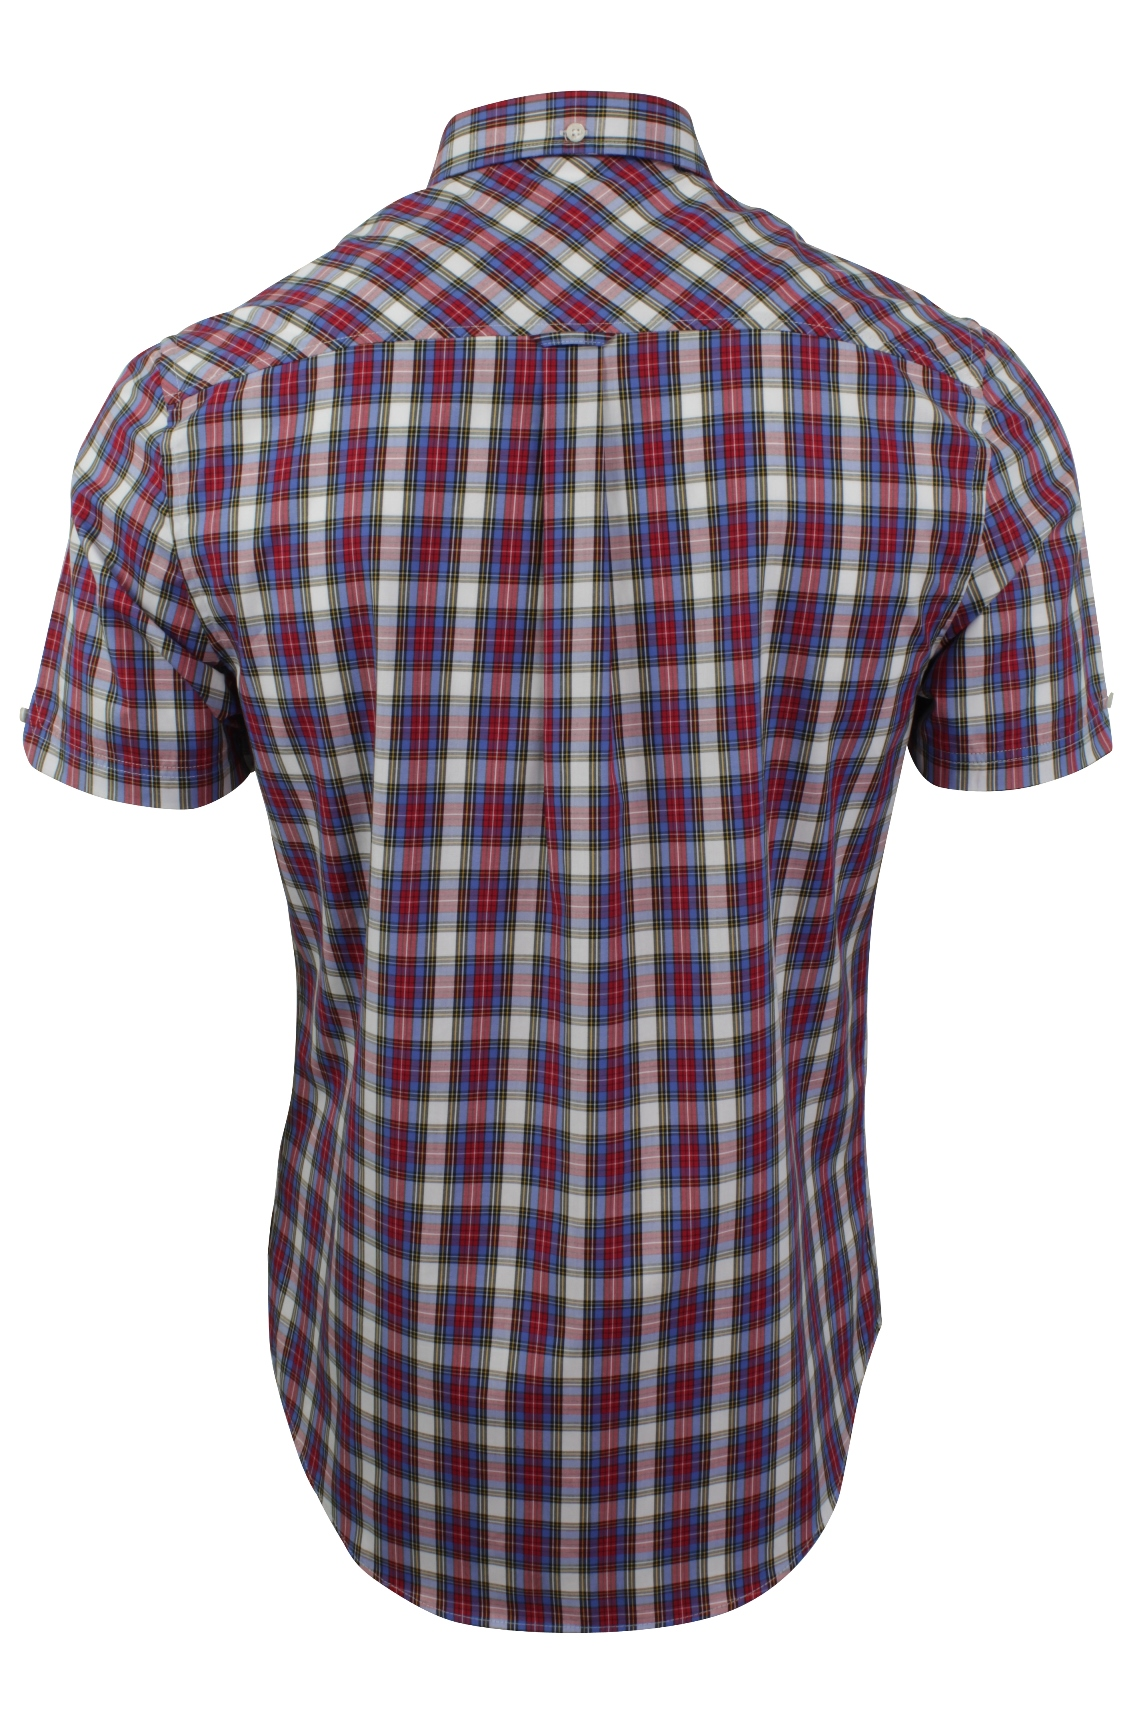 Mens-Tartan-Check-Shirt-by-Ben-Sherman-Short-Sleeved thumbnail 8